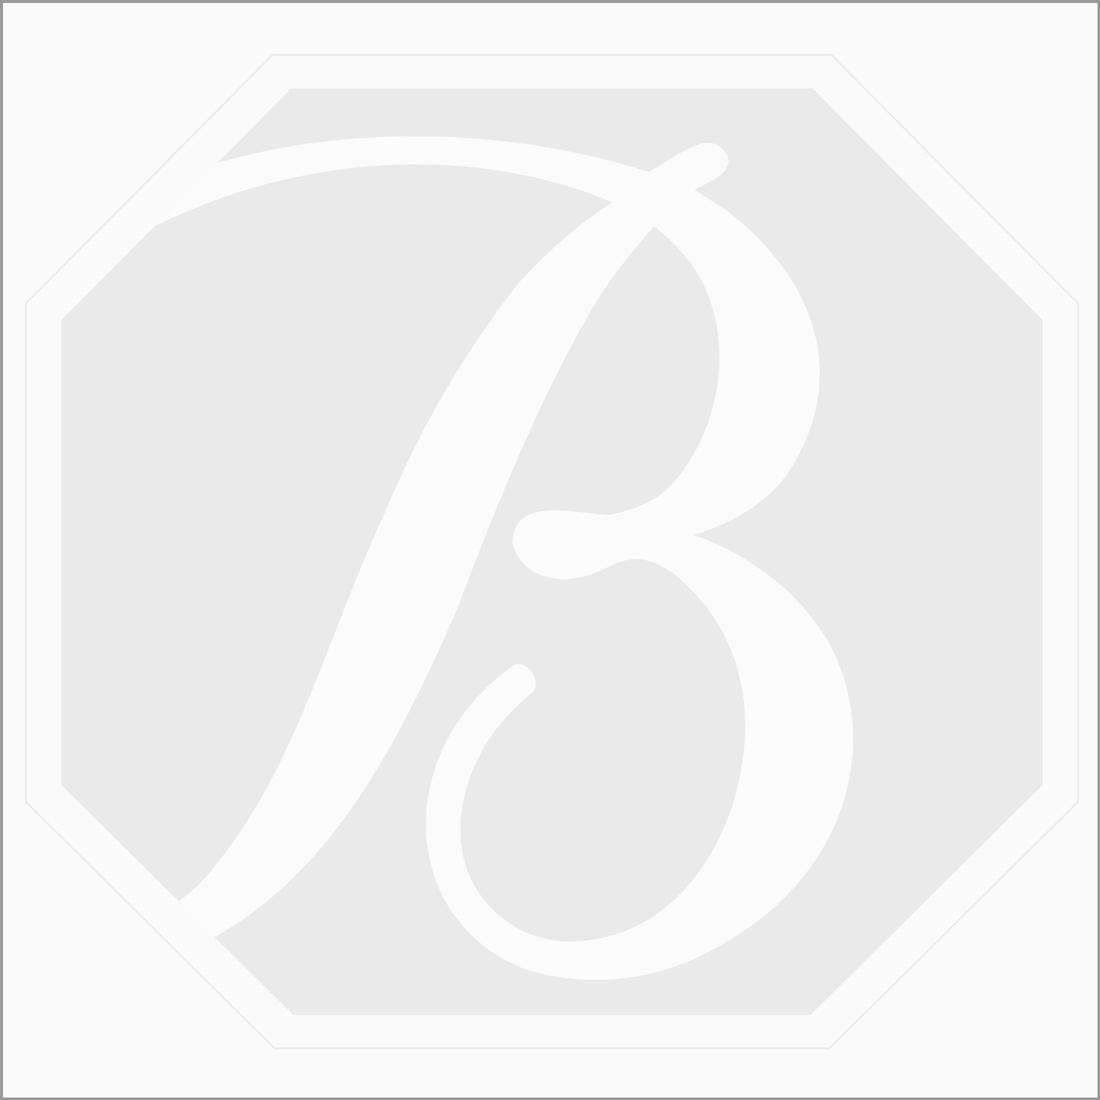 45 x 22 mm - Watermelon (Bi-Color) Tourmaline Carving - 102.00 carats (ToCarv1027)